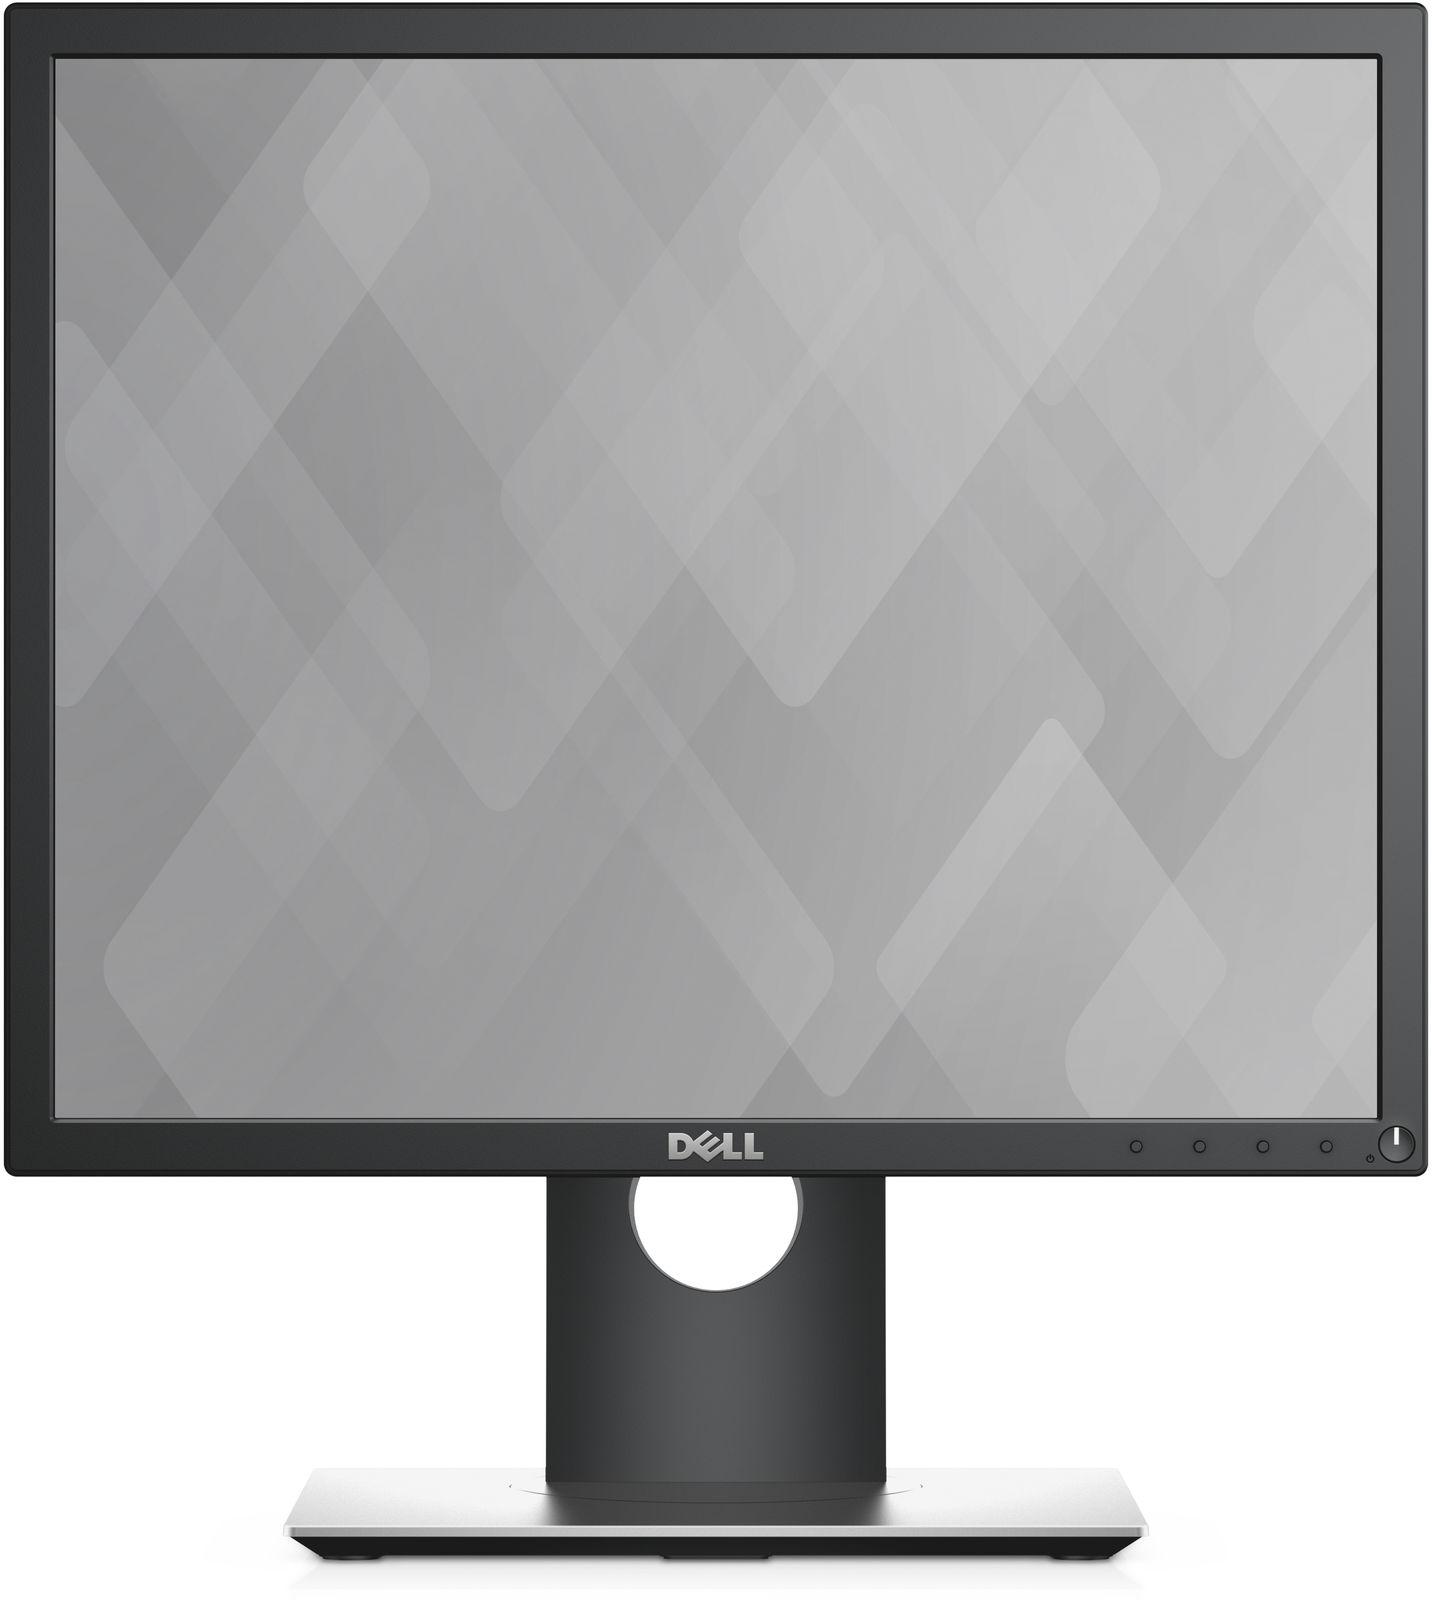 "DELL P1917S LED display 48.3 cm (19"") 1280 x 1024 pixels SXGA Flat Matt Black"